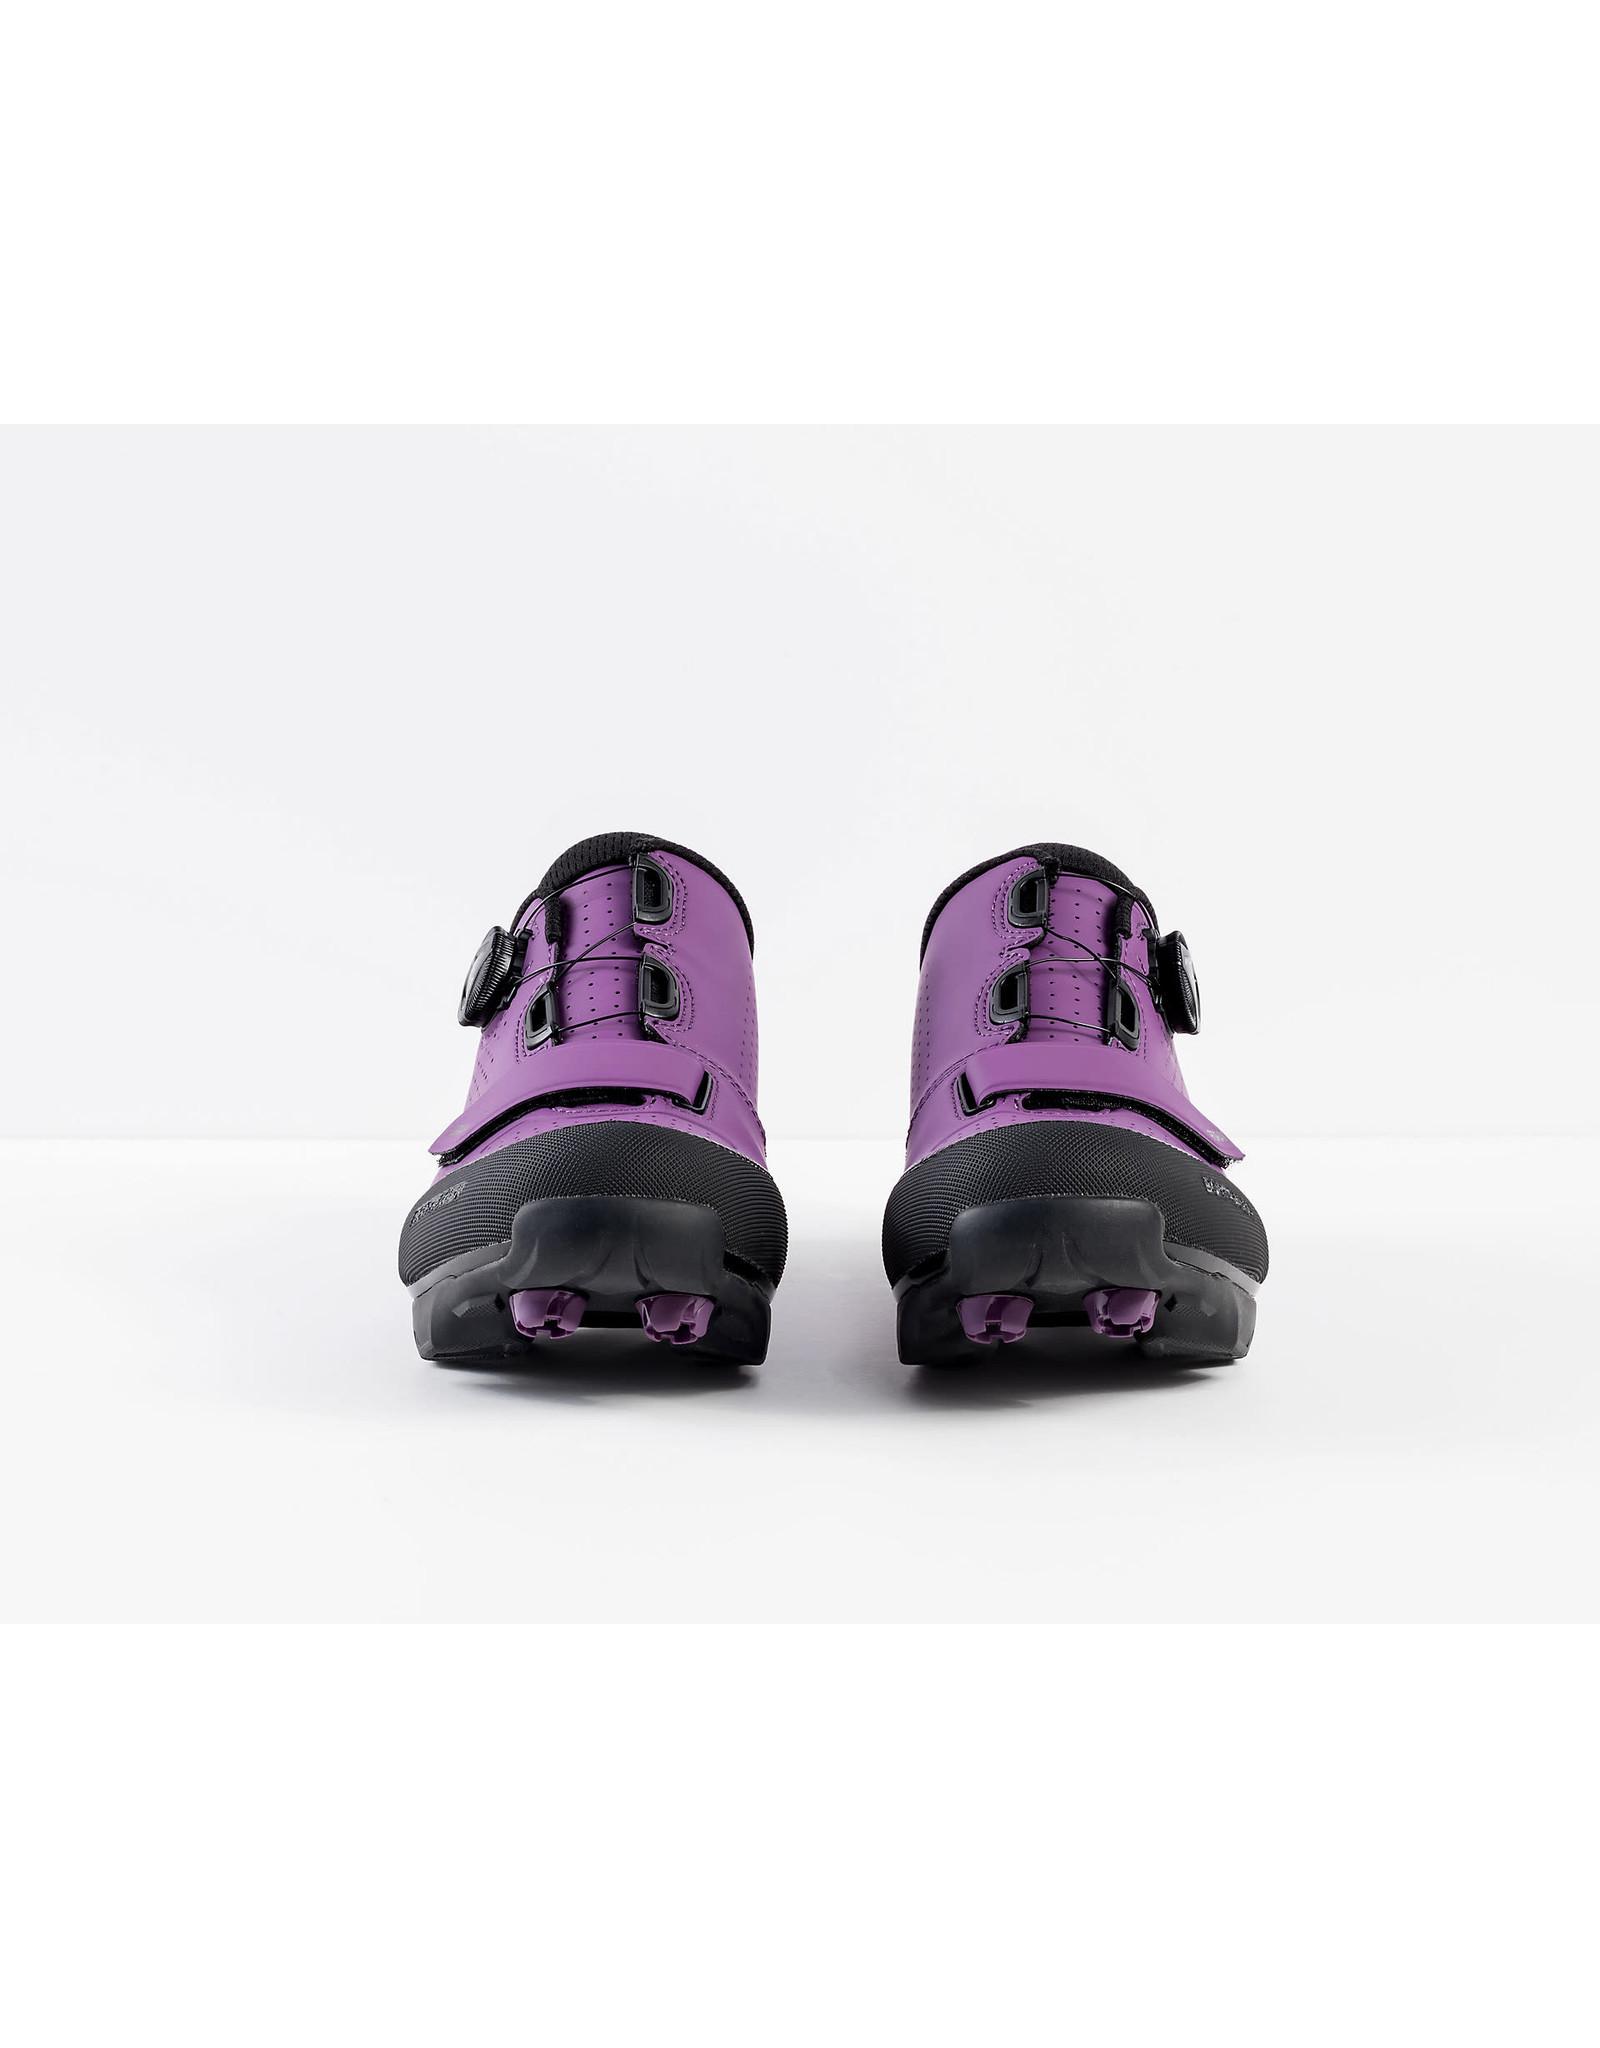 Bontrager Chaussures de VTT Bontrager Foray pour femmes